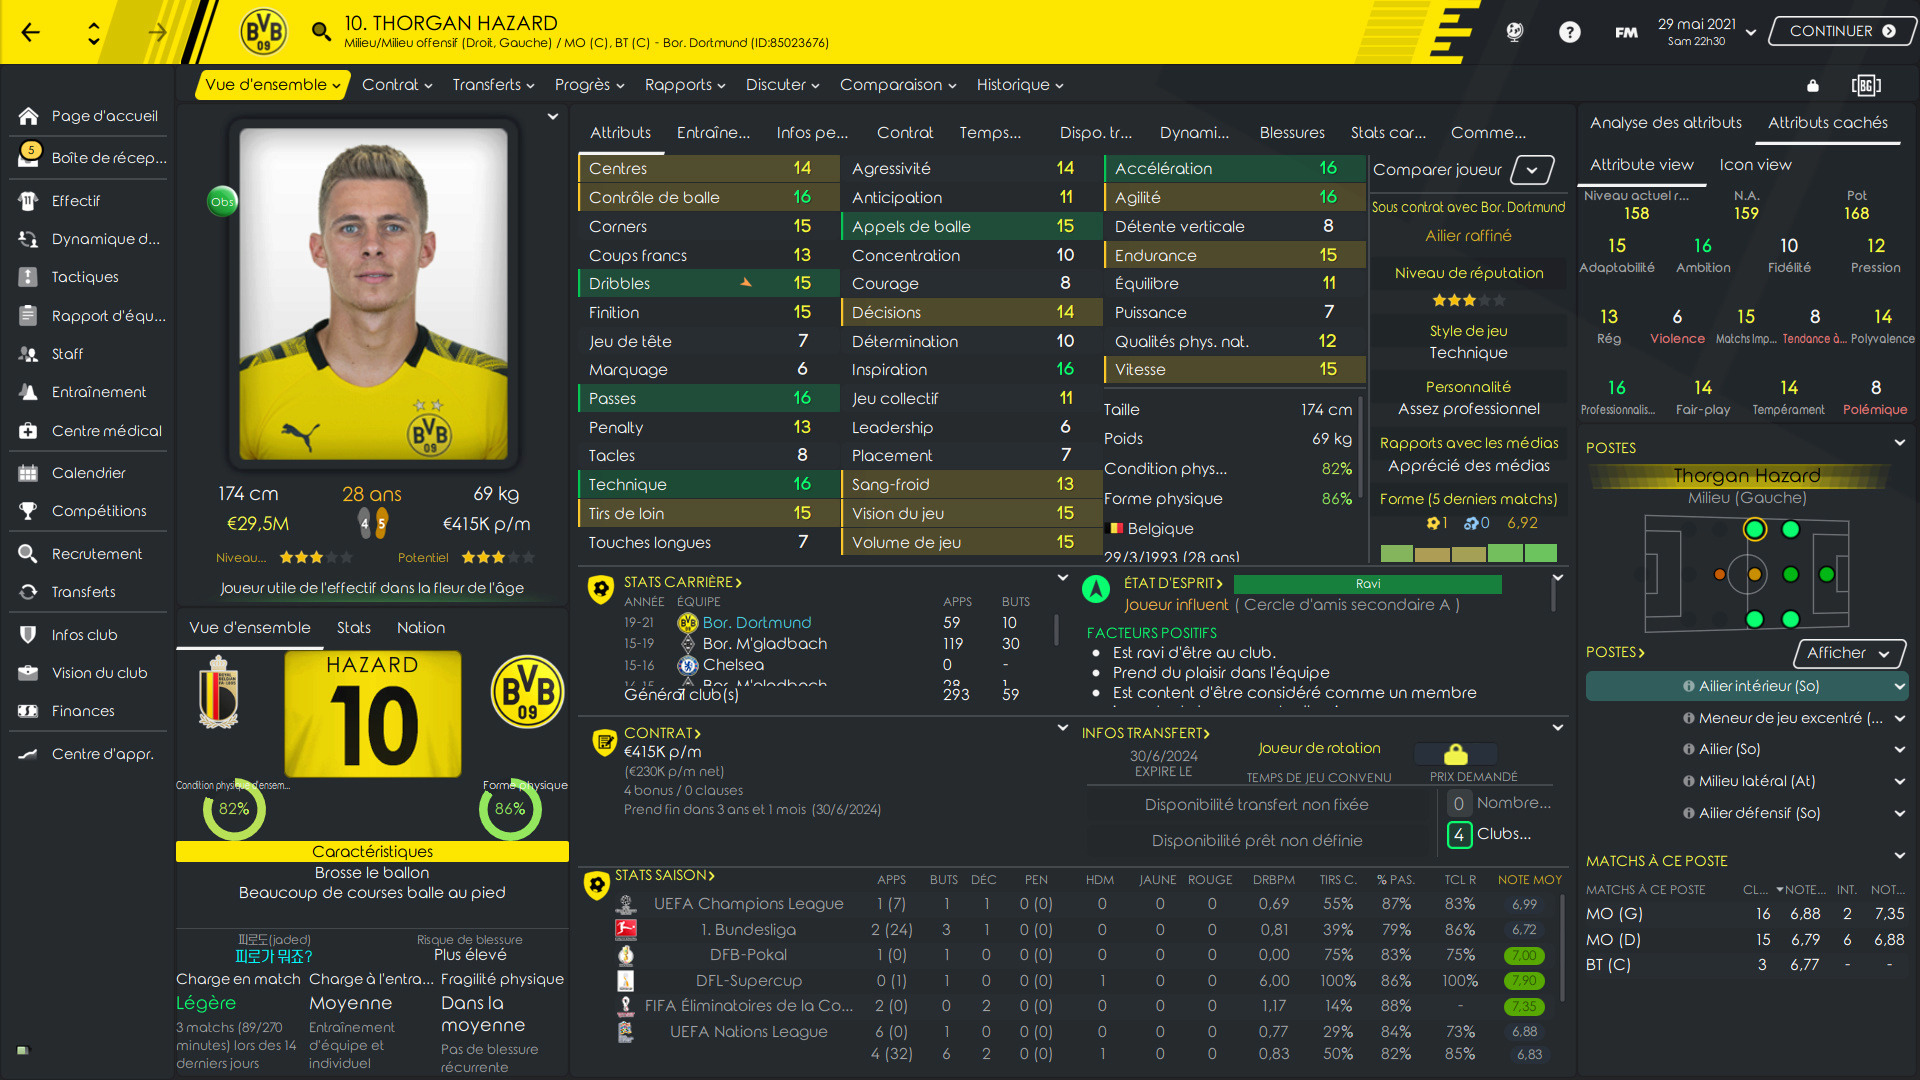 Dortmund ventes et prêts Hazard10